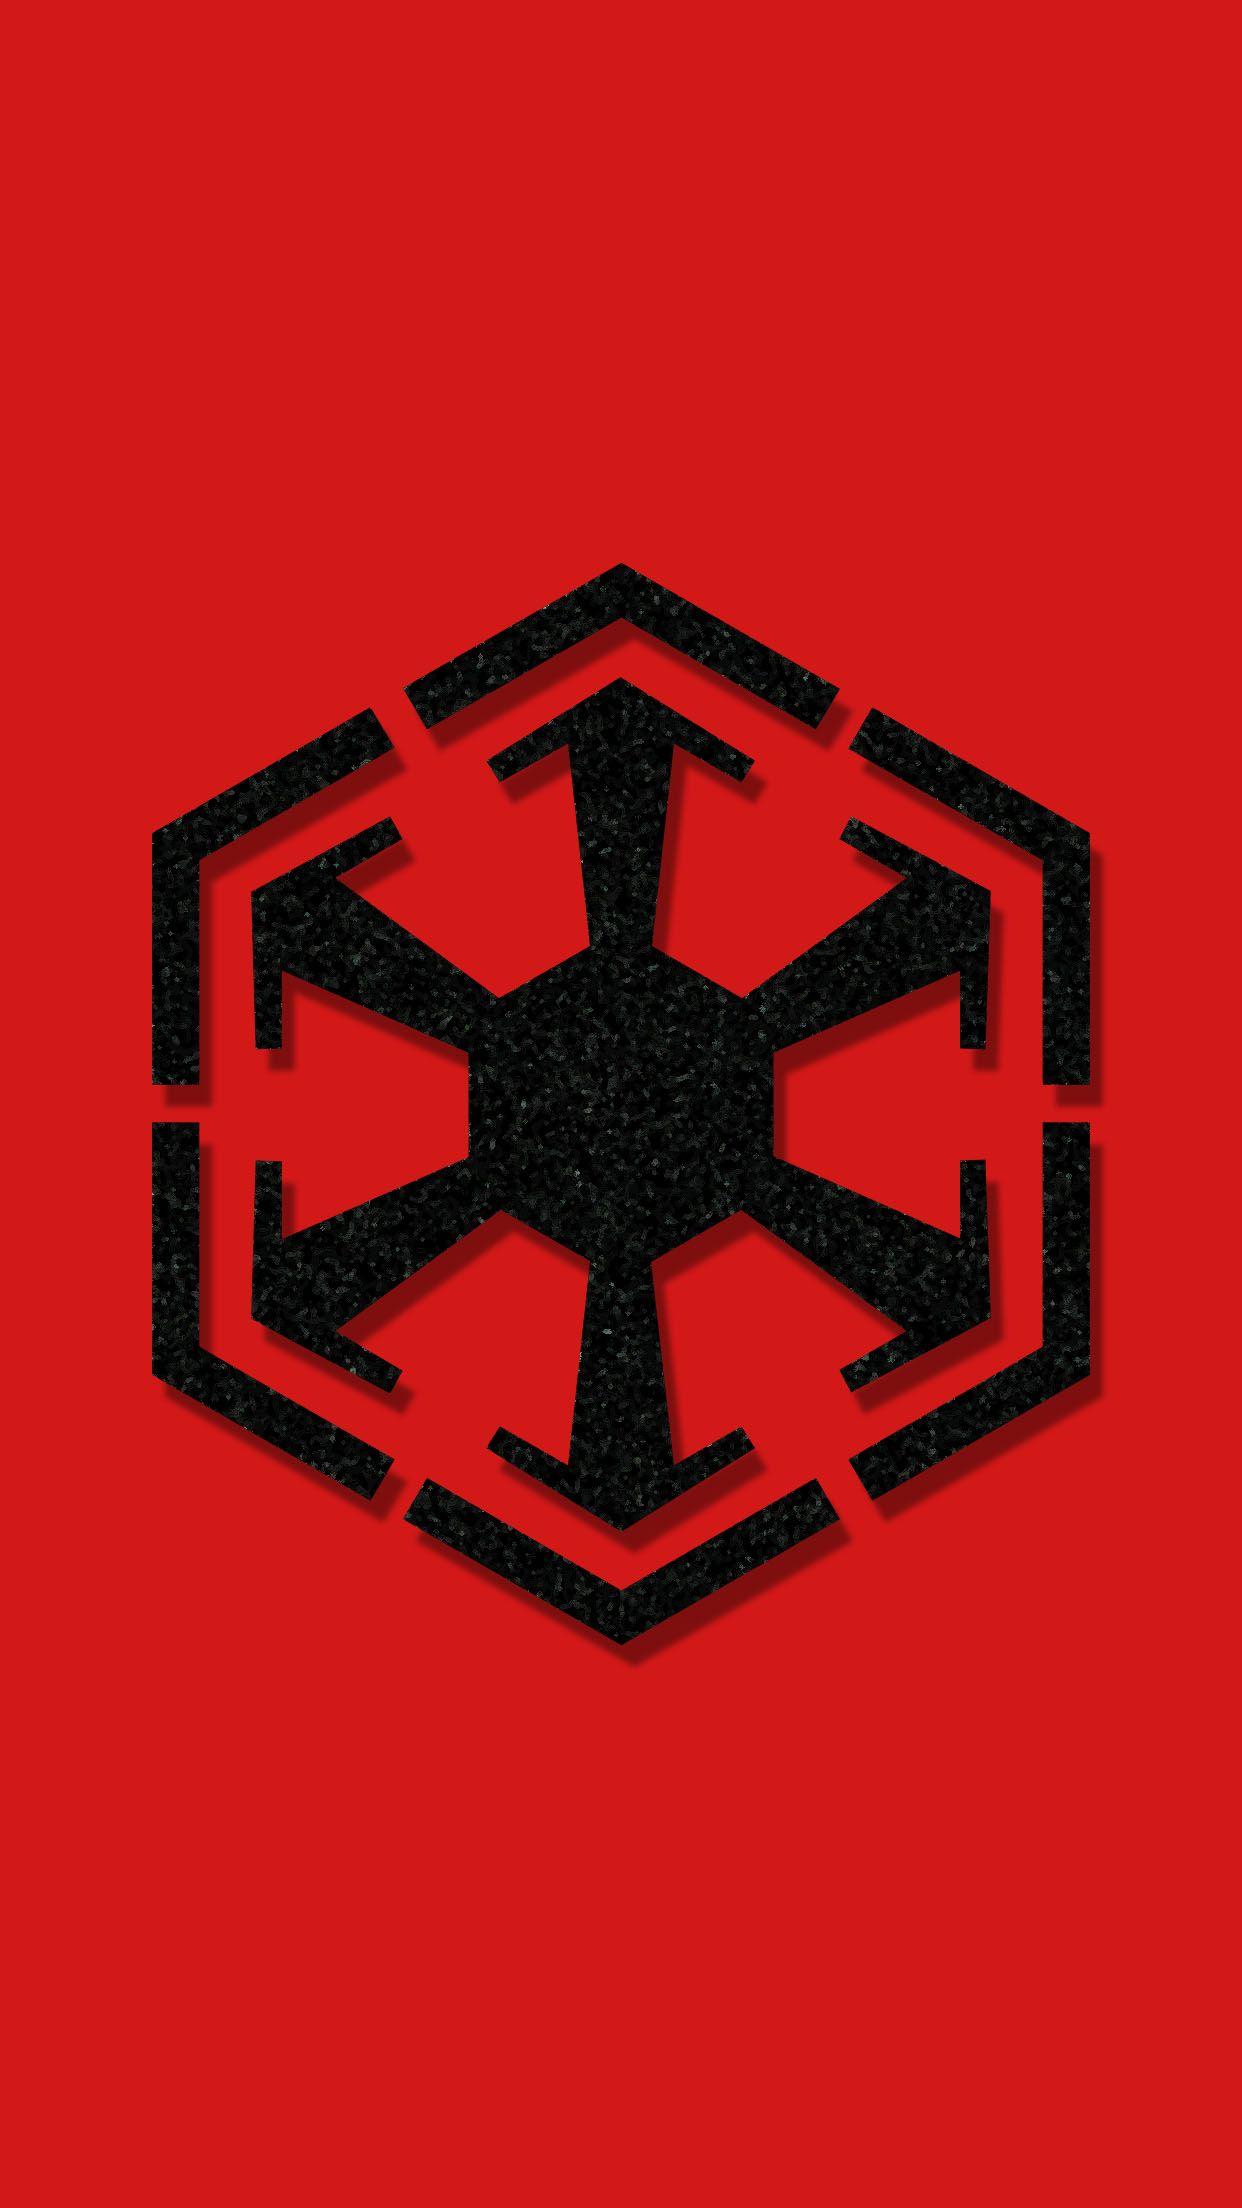 Star Wars Sith Empire Wallpaper Desktop On Wallpaper 1080p Hd Star Wars Sith Empire Star Wars Sith Sith Empire